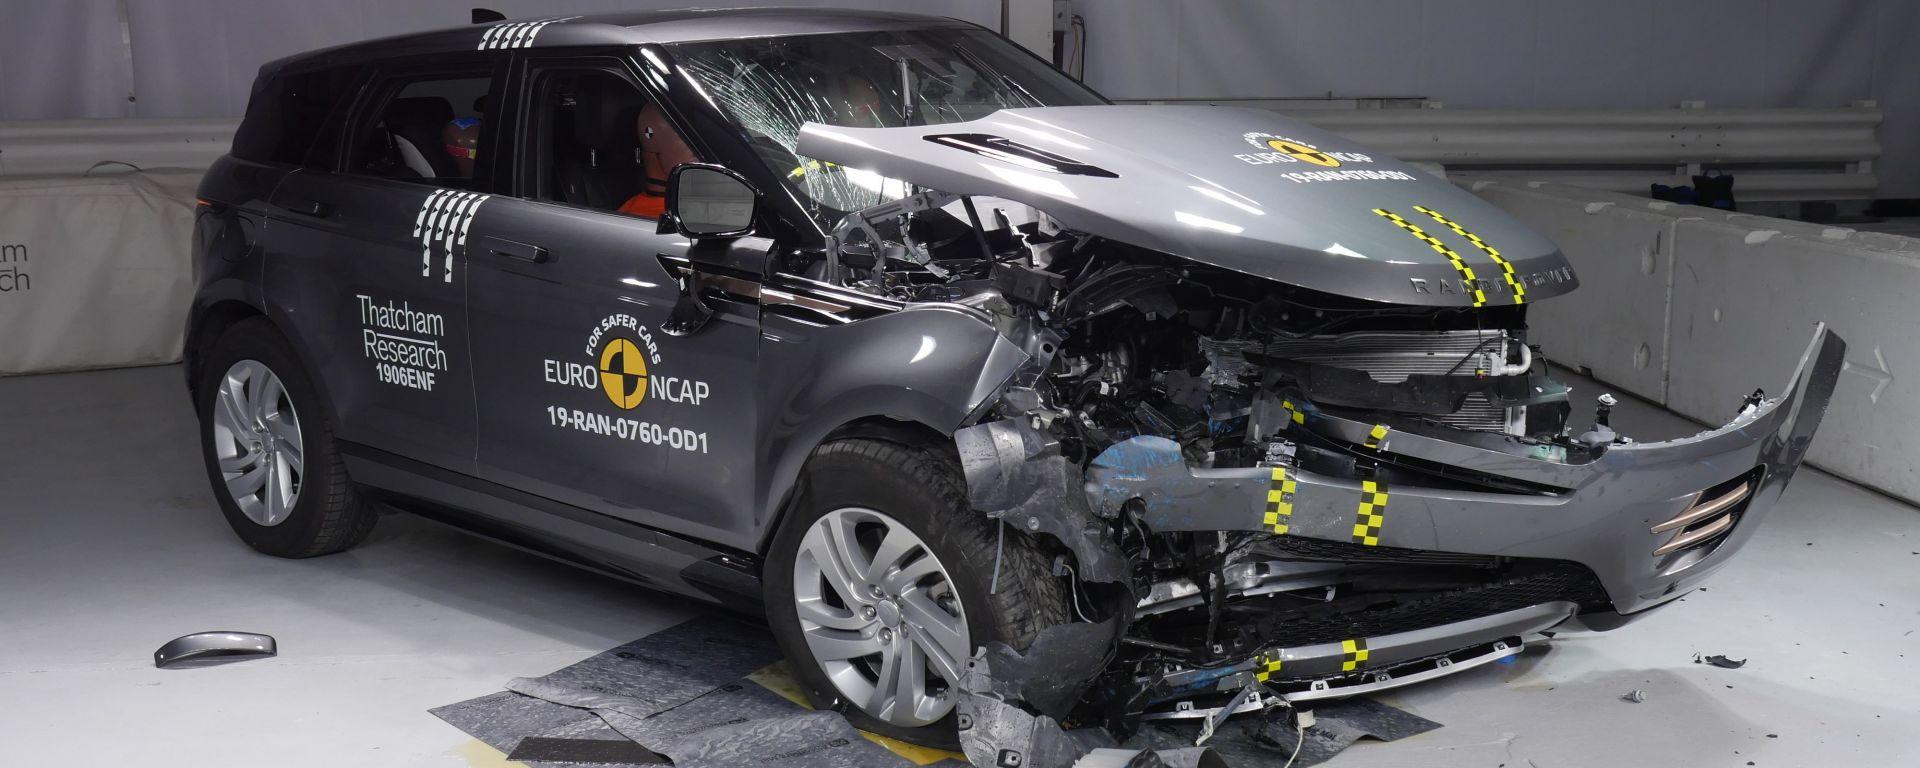 Crash Test Range Rover Evoque 2019 5 impatto frontale